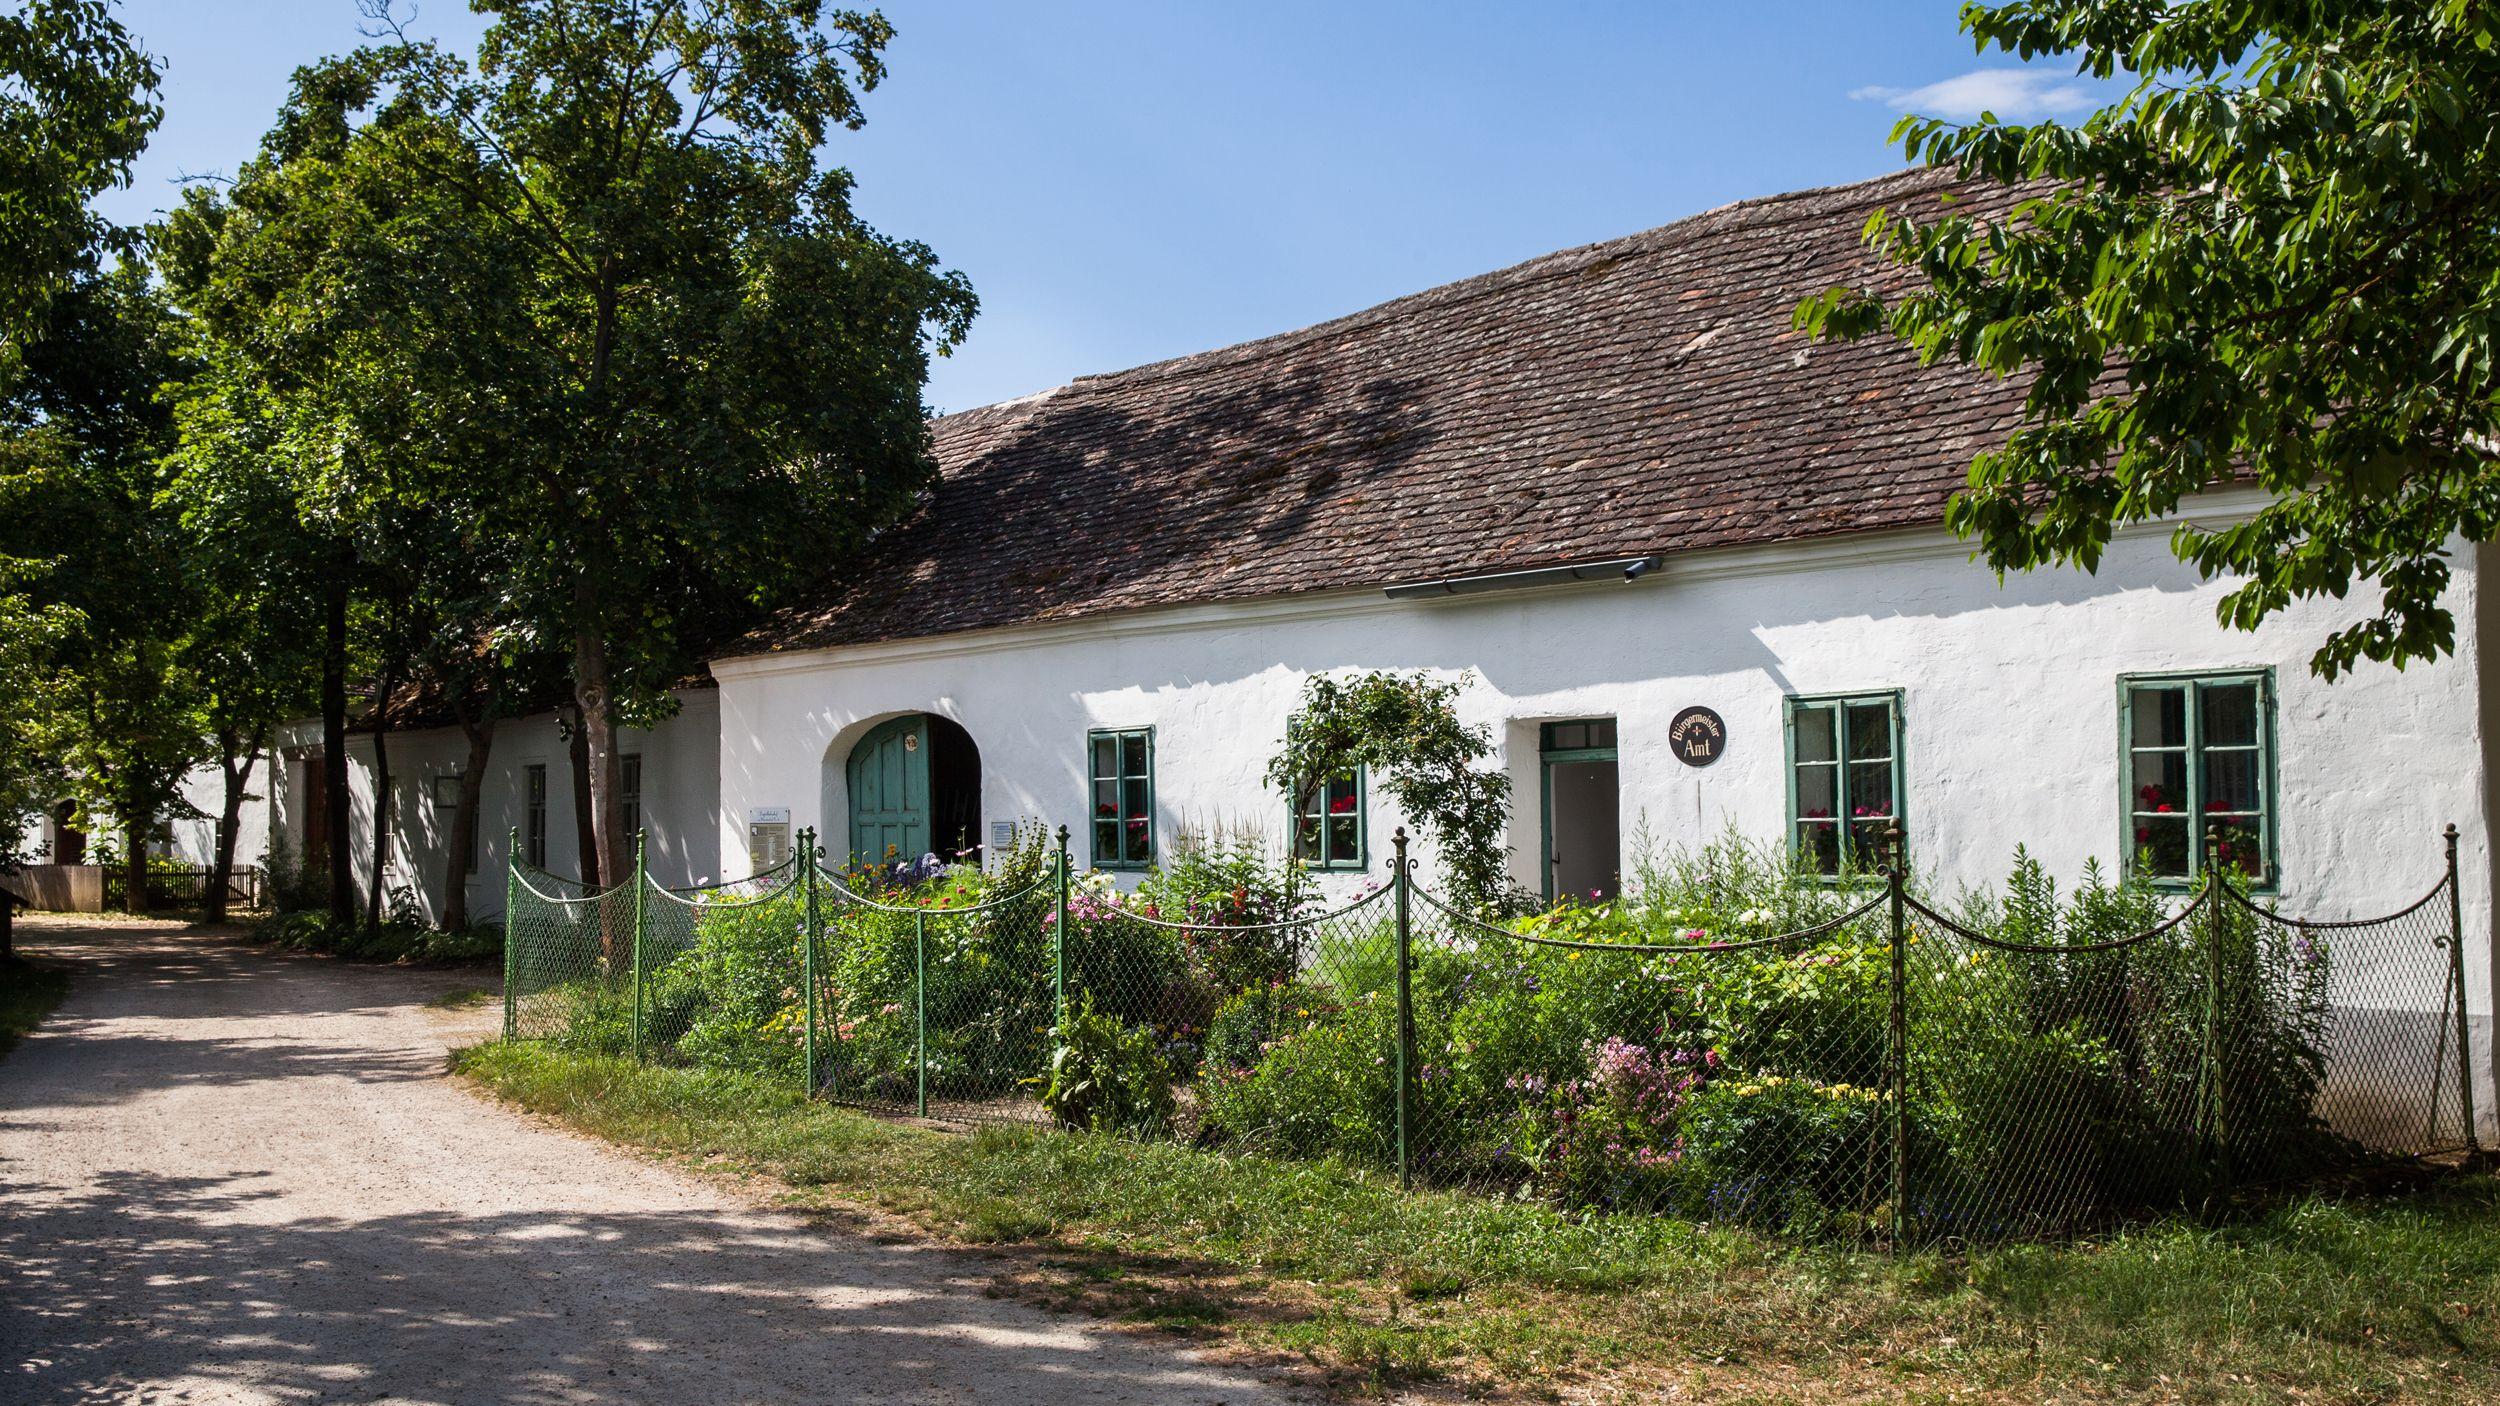 2500x1406_Museumsdorf Niedersulz_by_Nadja Meister_IMG_8641_MODIF-compressor.jpg